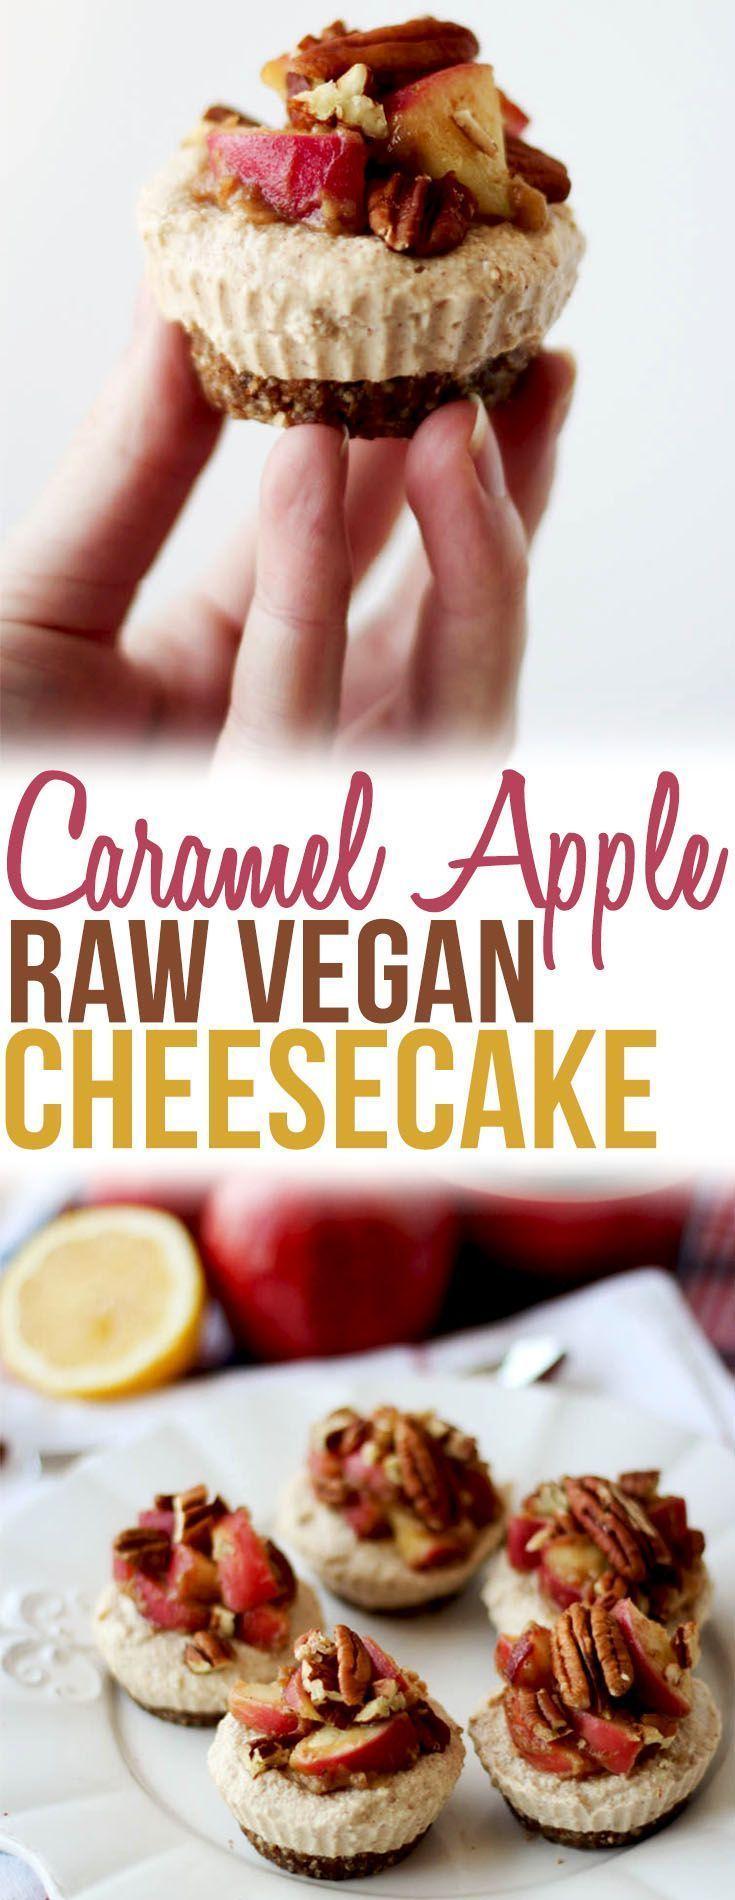 Caramel Apple Raw Vegan Cheesecake   Gluten Free & No Refined Sugar - Abbey's Kitchen